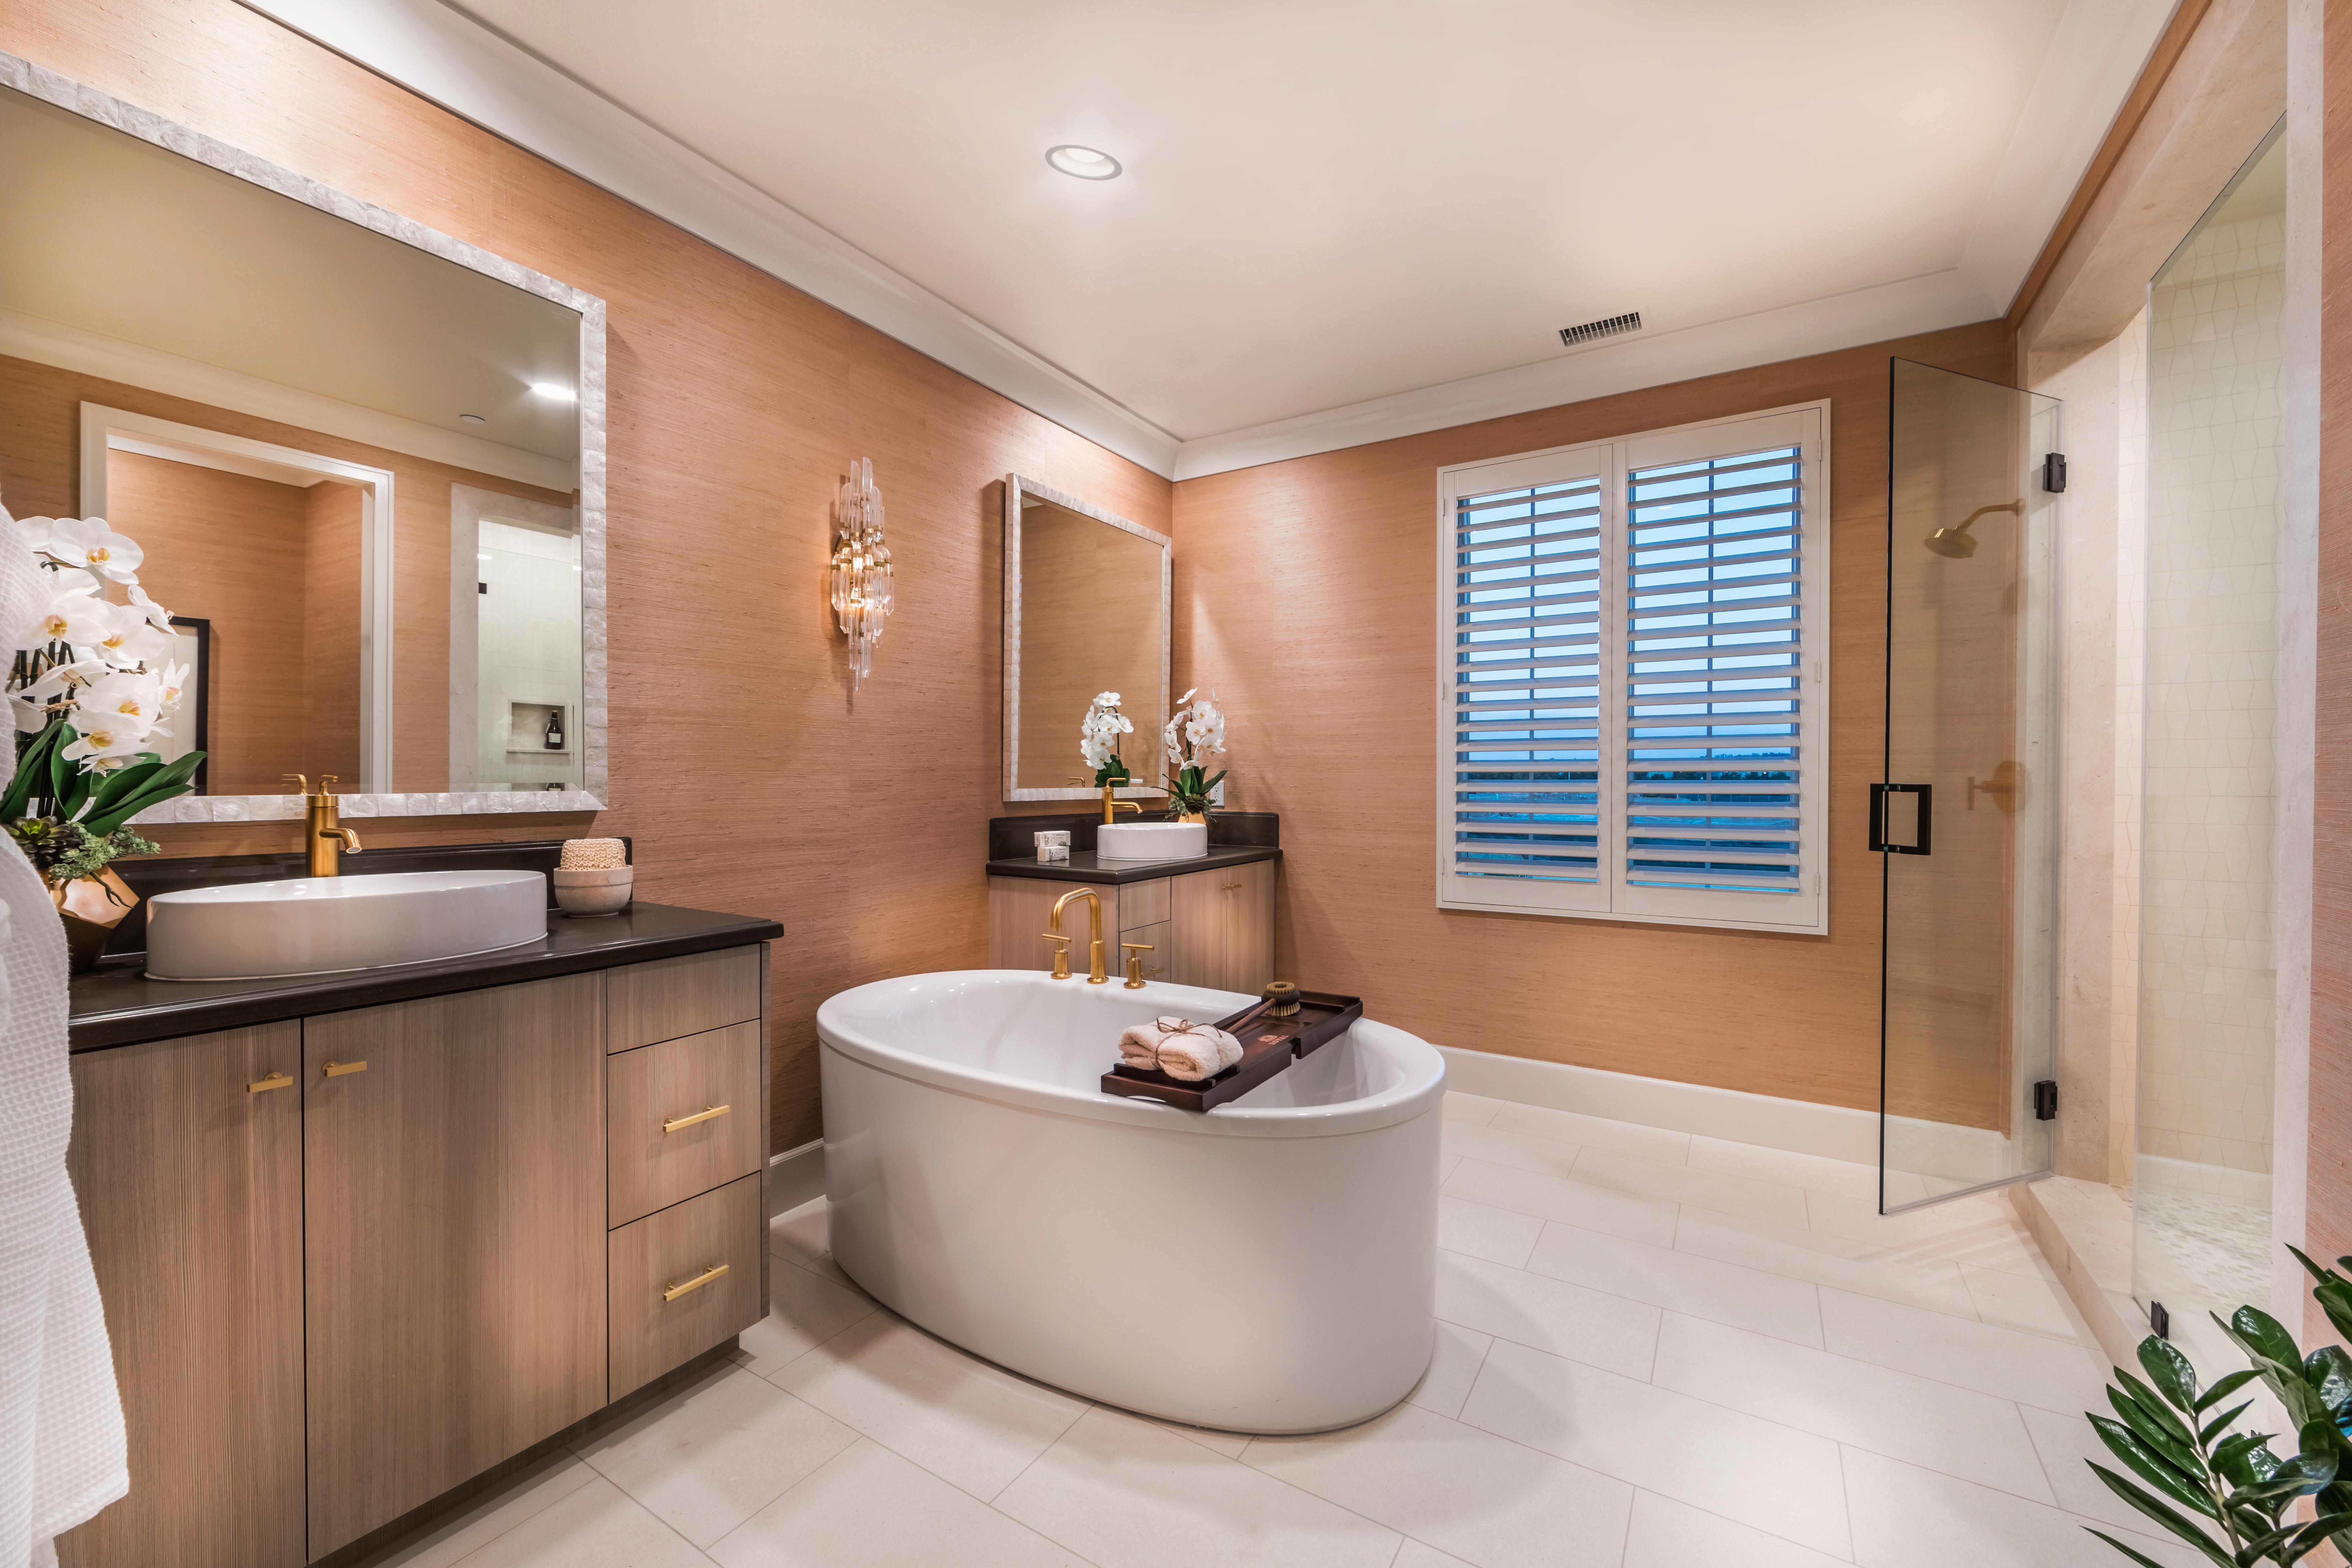 Irvine Pacific | New Home Builder In Orange County